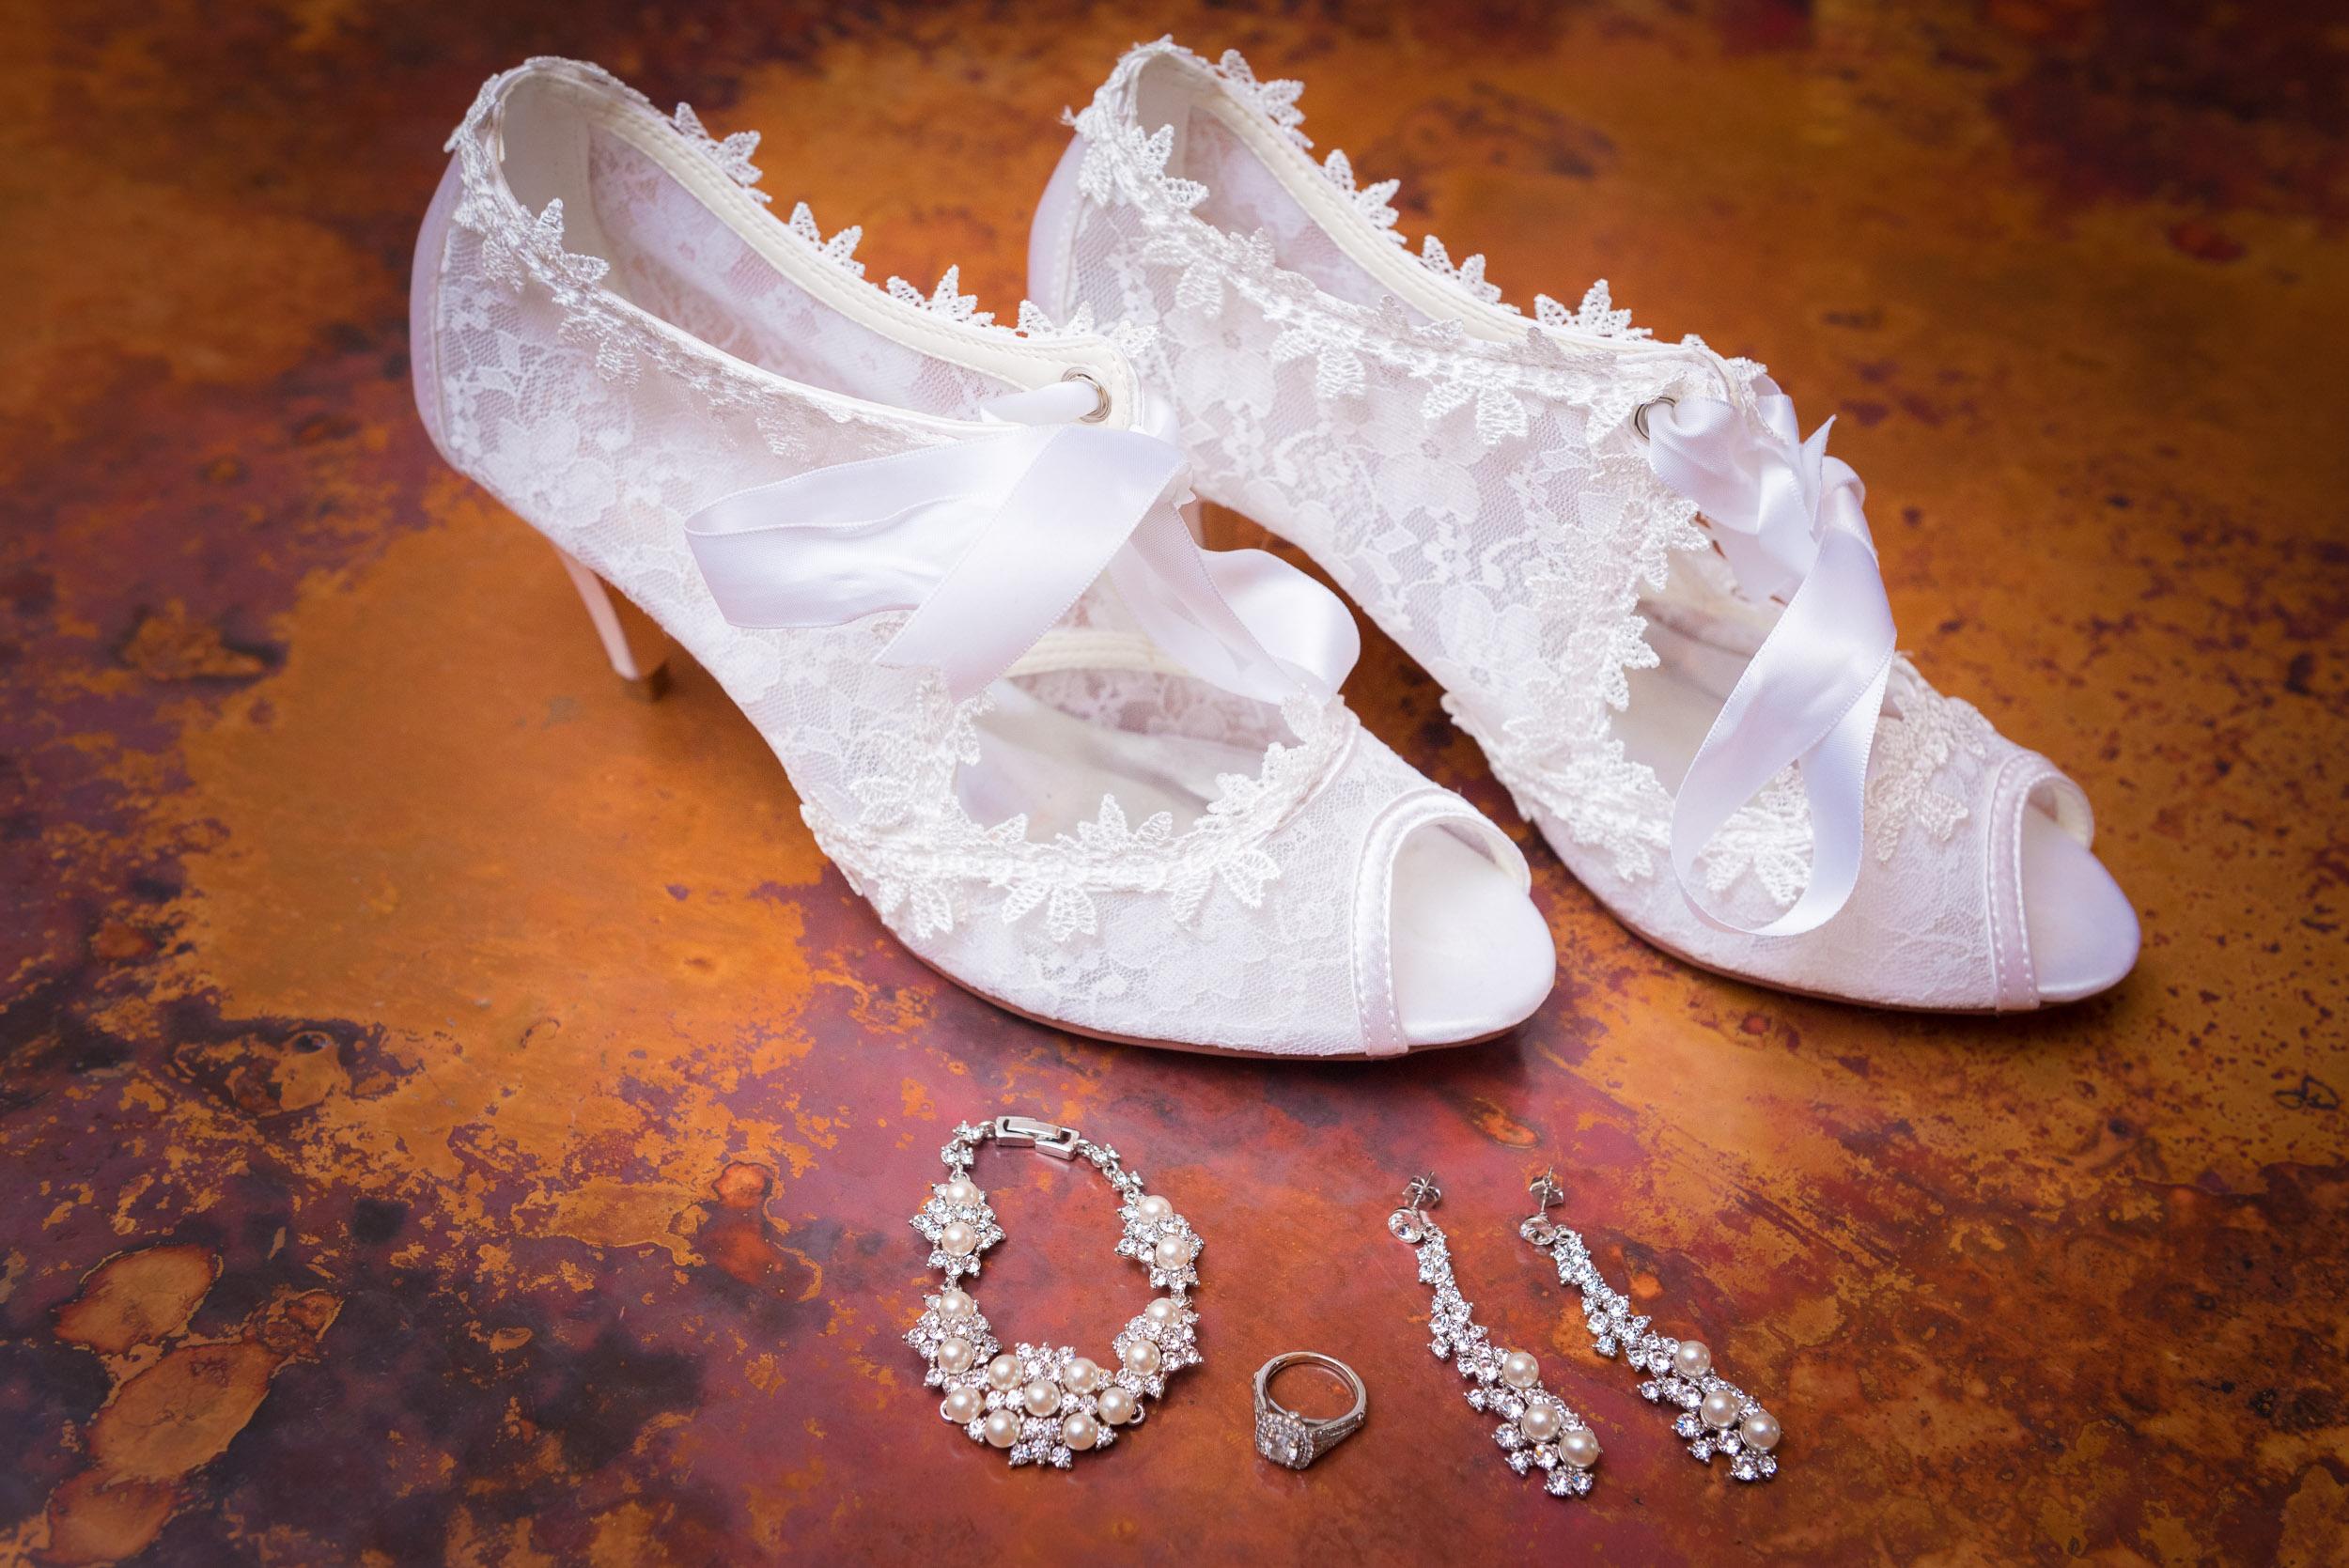 Bride-Shoes-Jewelery.jpg